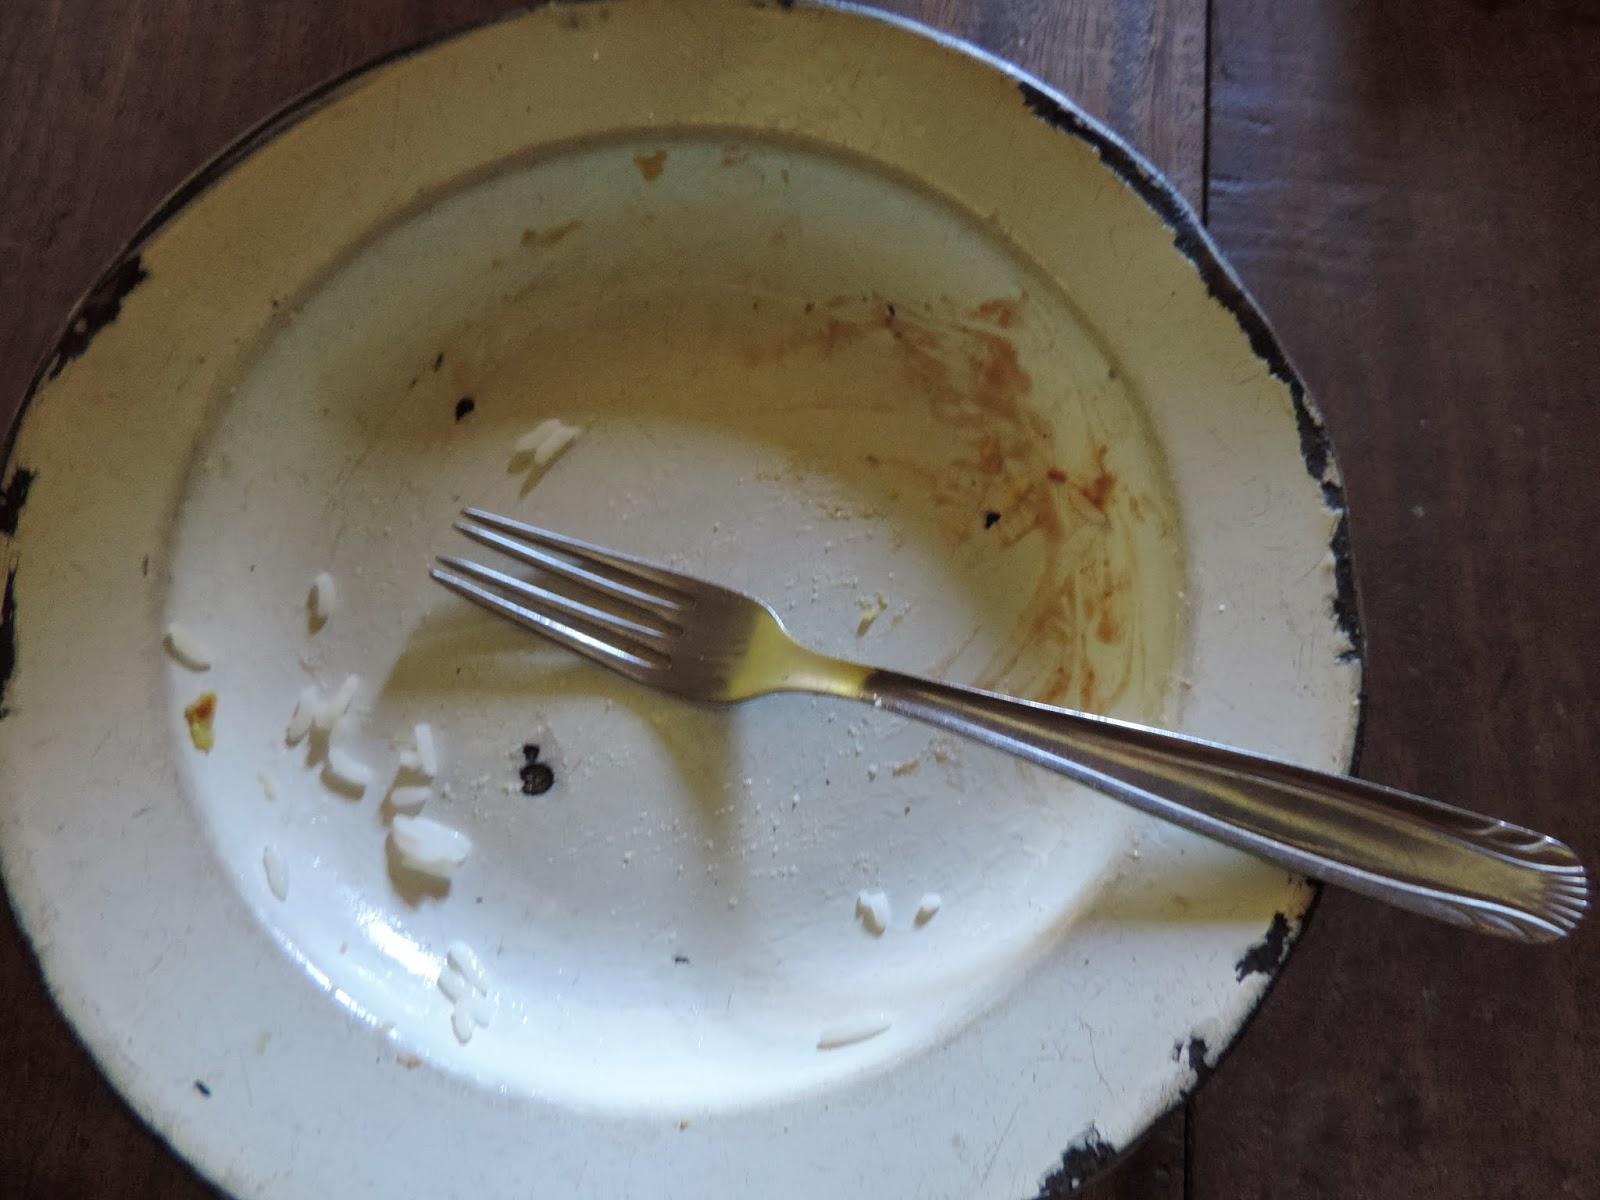 prato-de-comida-vazio fome - foto internet